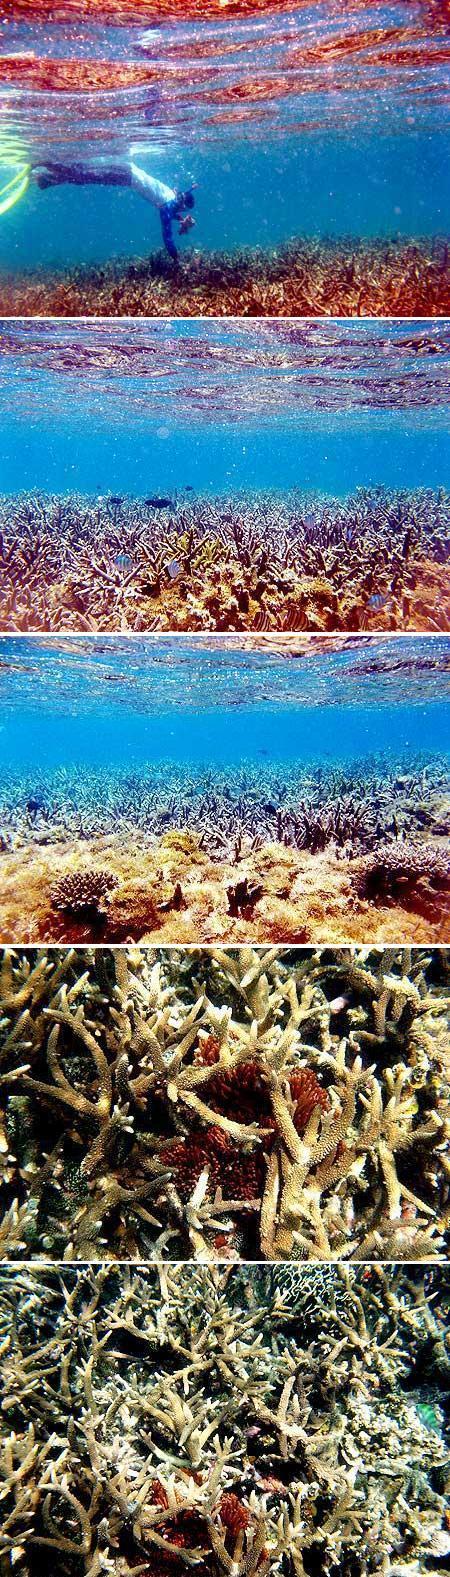 Terumbu karang sebelah timur Karang Kering, Sungailiat, Bangka, didominasi oleh jenis karang branching